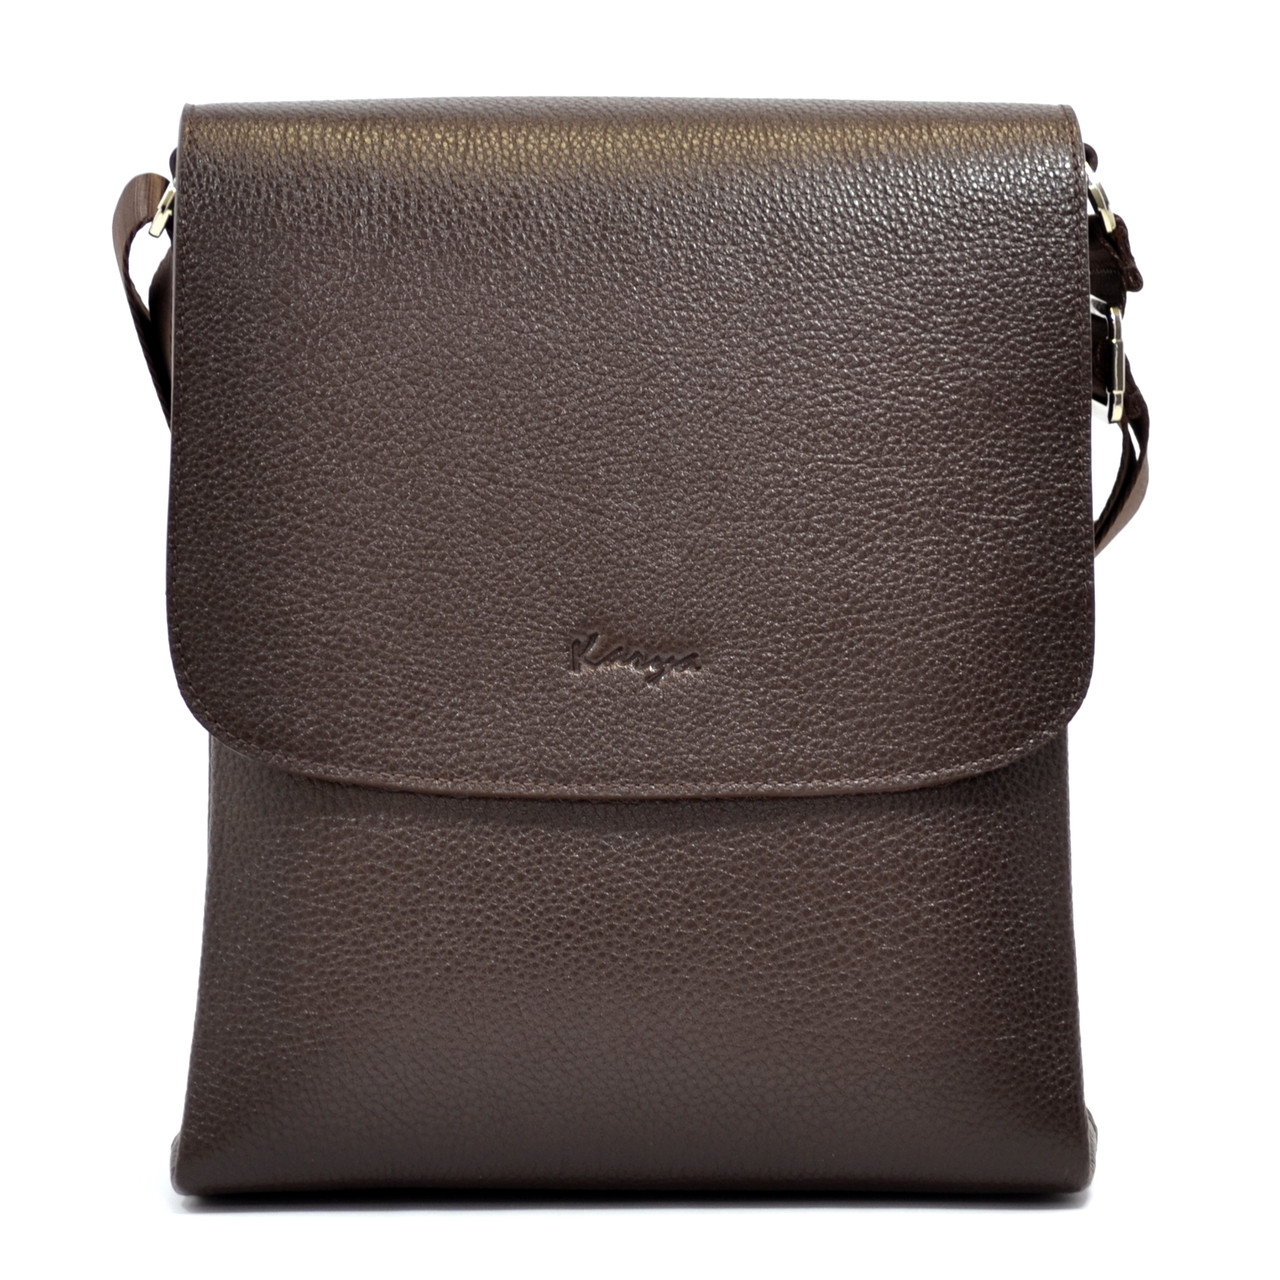 1ad8b8e0ac46 Мужская сумка Karya из натуральной кожи от интернет-магазина